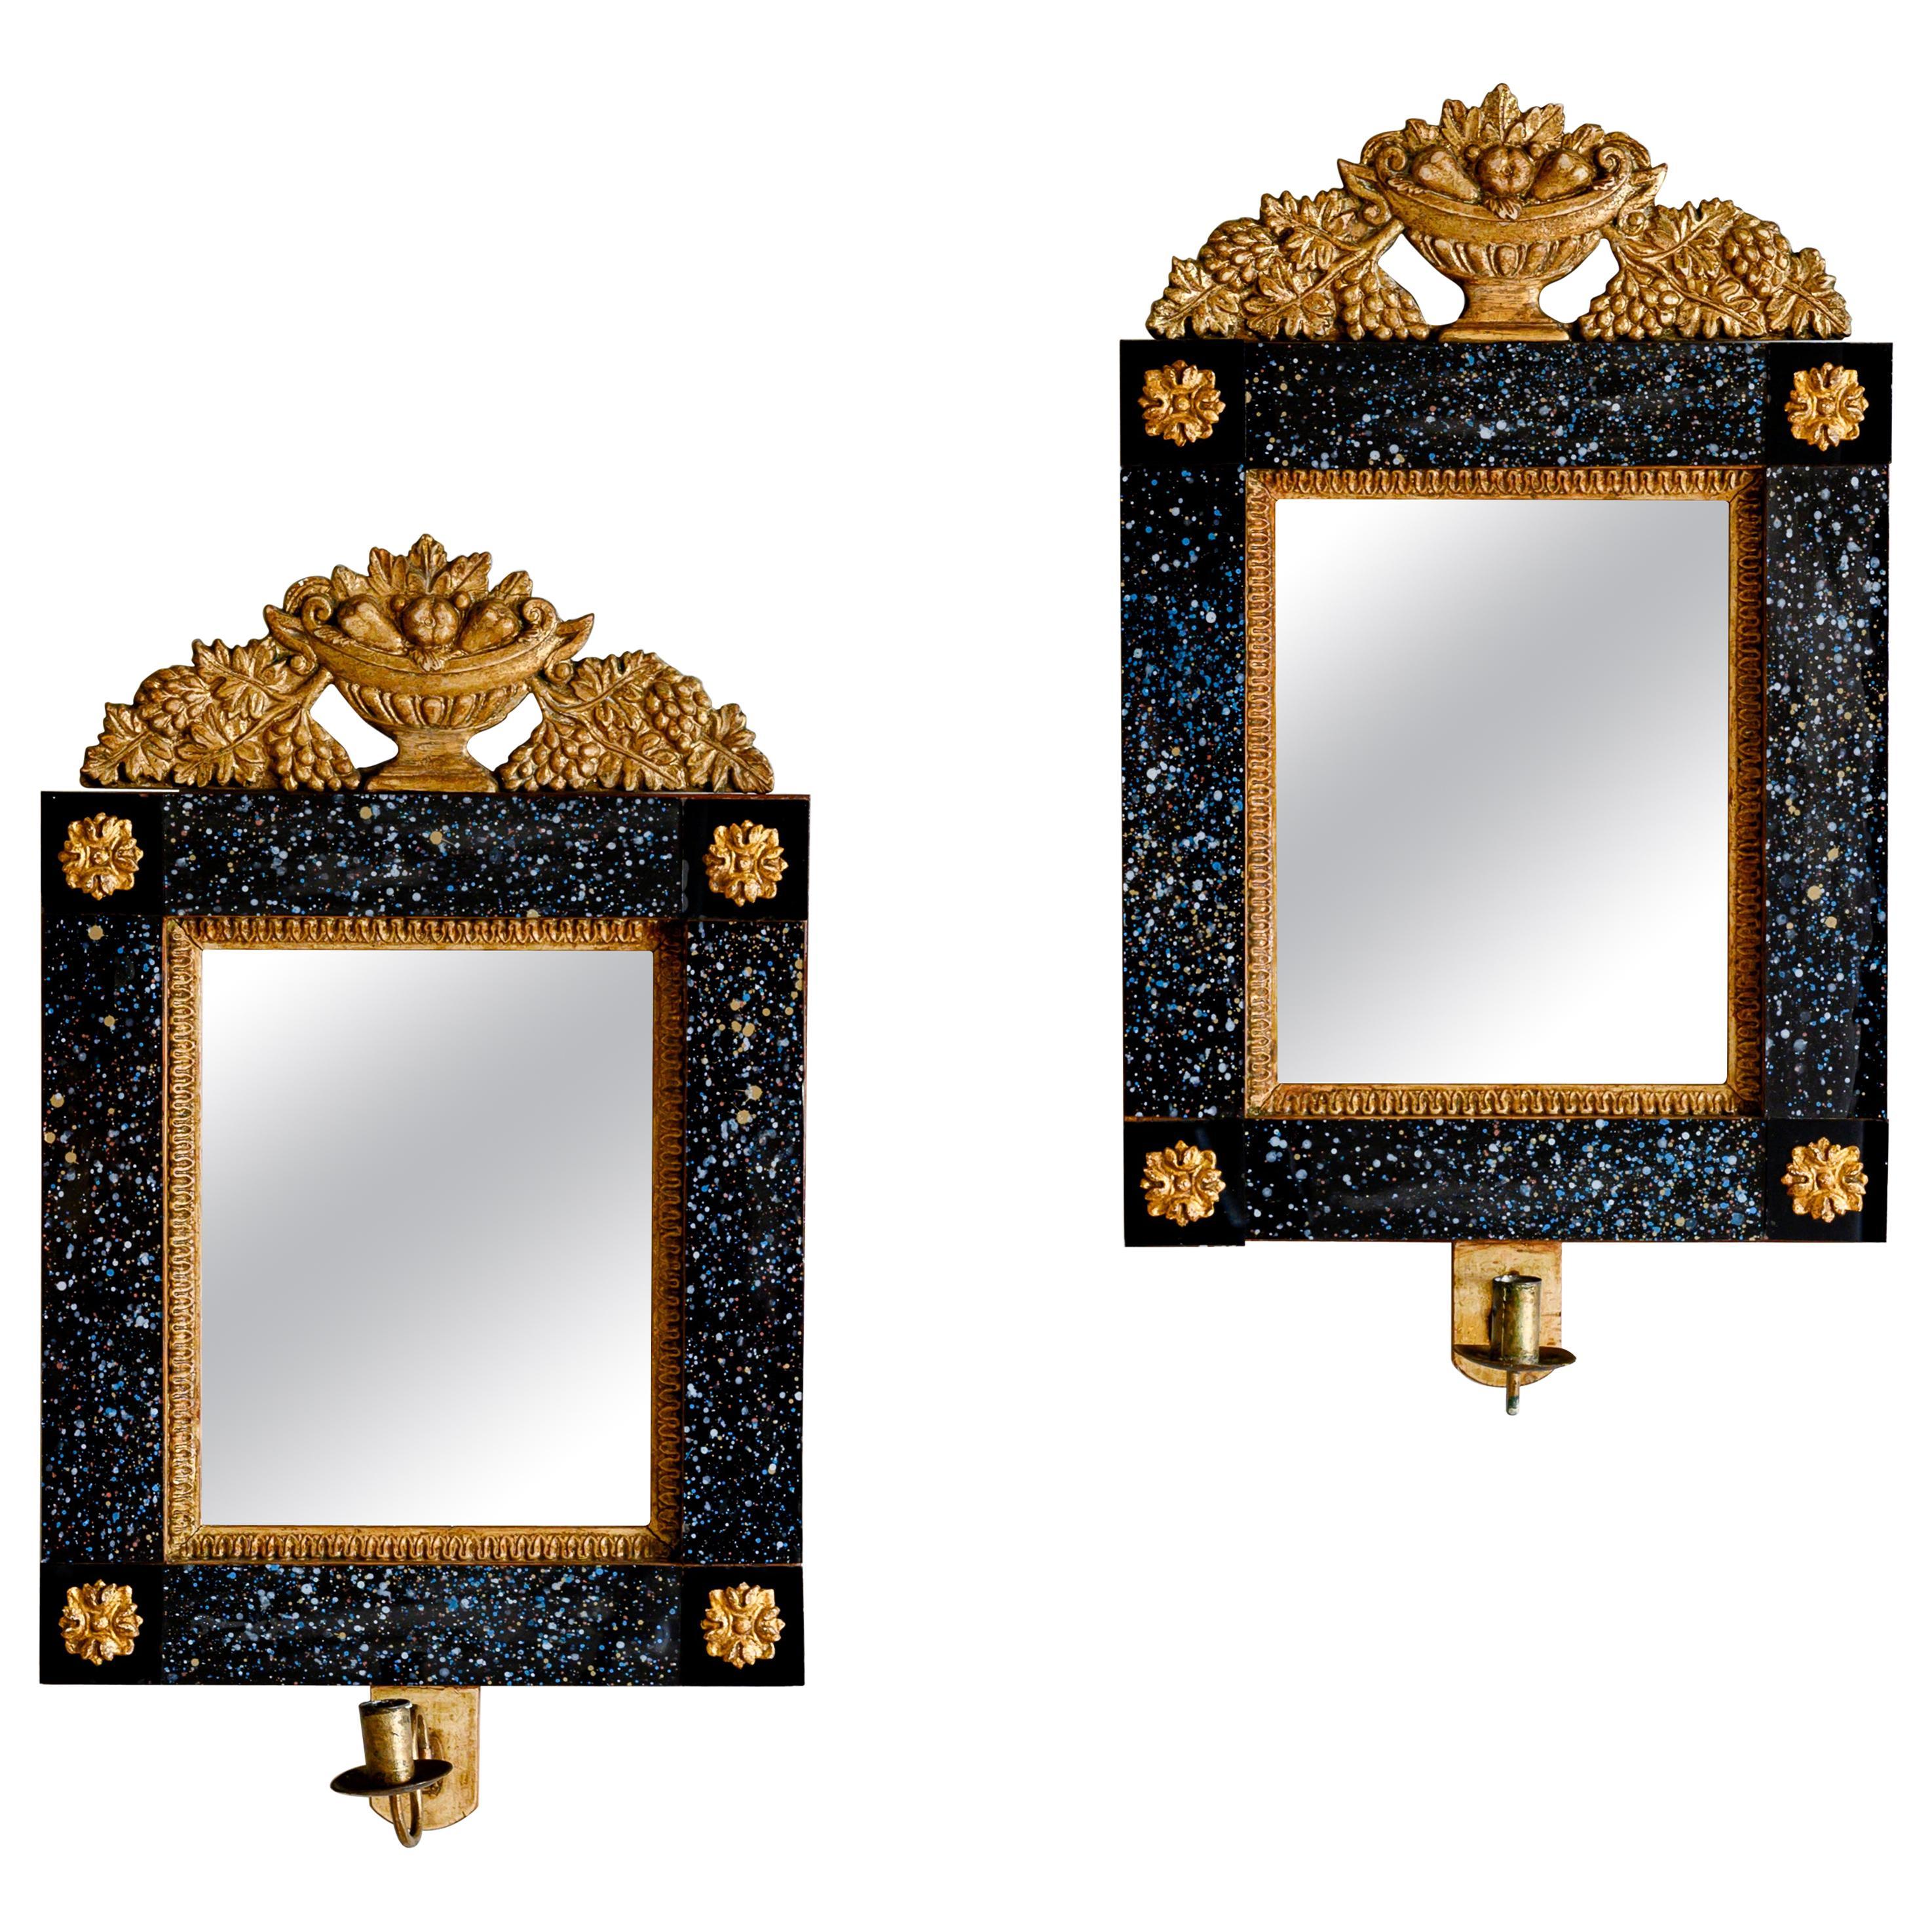 19th Century Swedish Empire Mirror Sconces